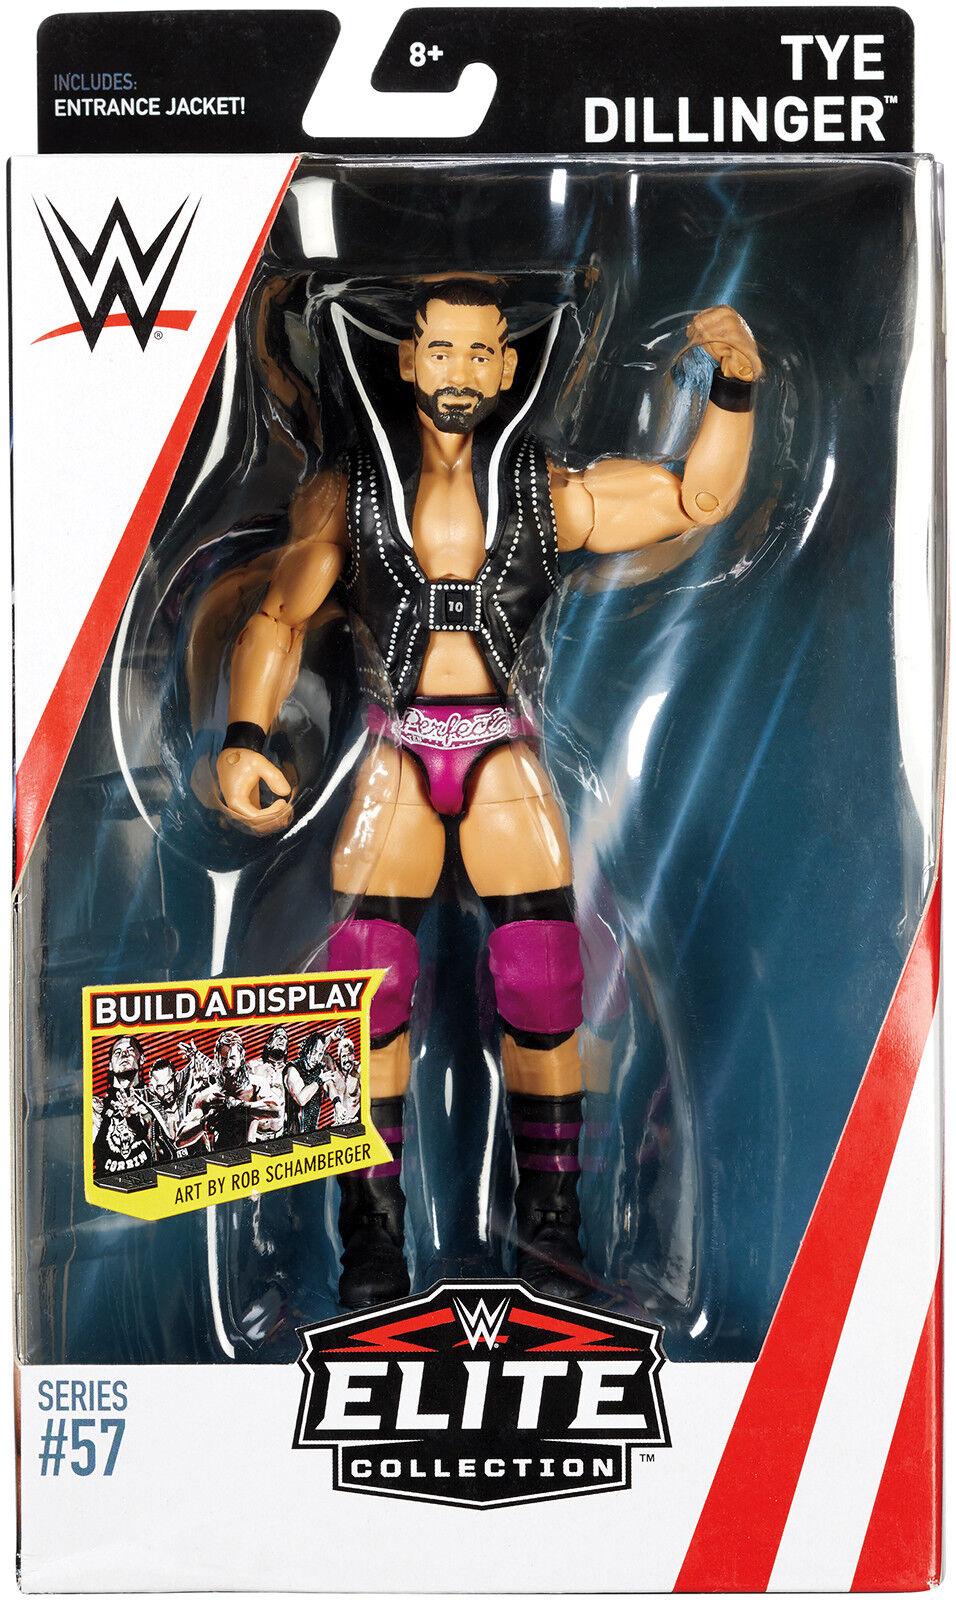 Wwe Mattel Serie 57 Aktion Wrestling-Figur Tye Dillinger 10 Nxt Zubehör